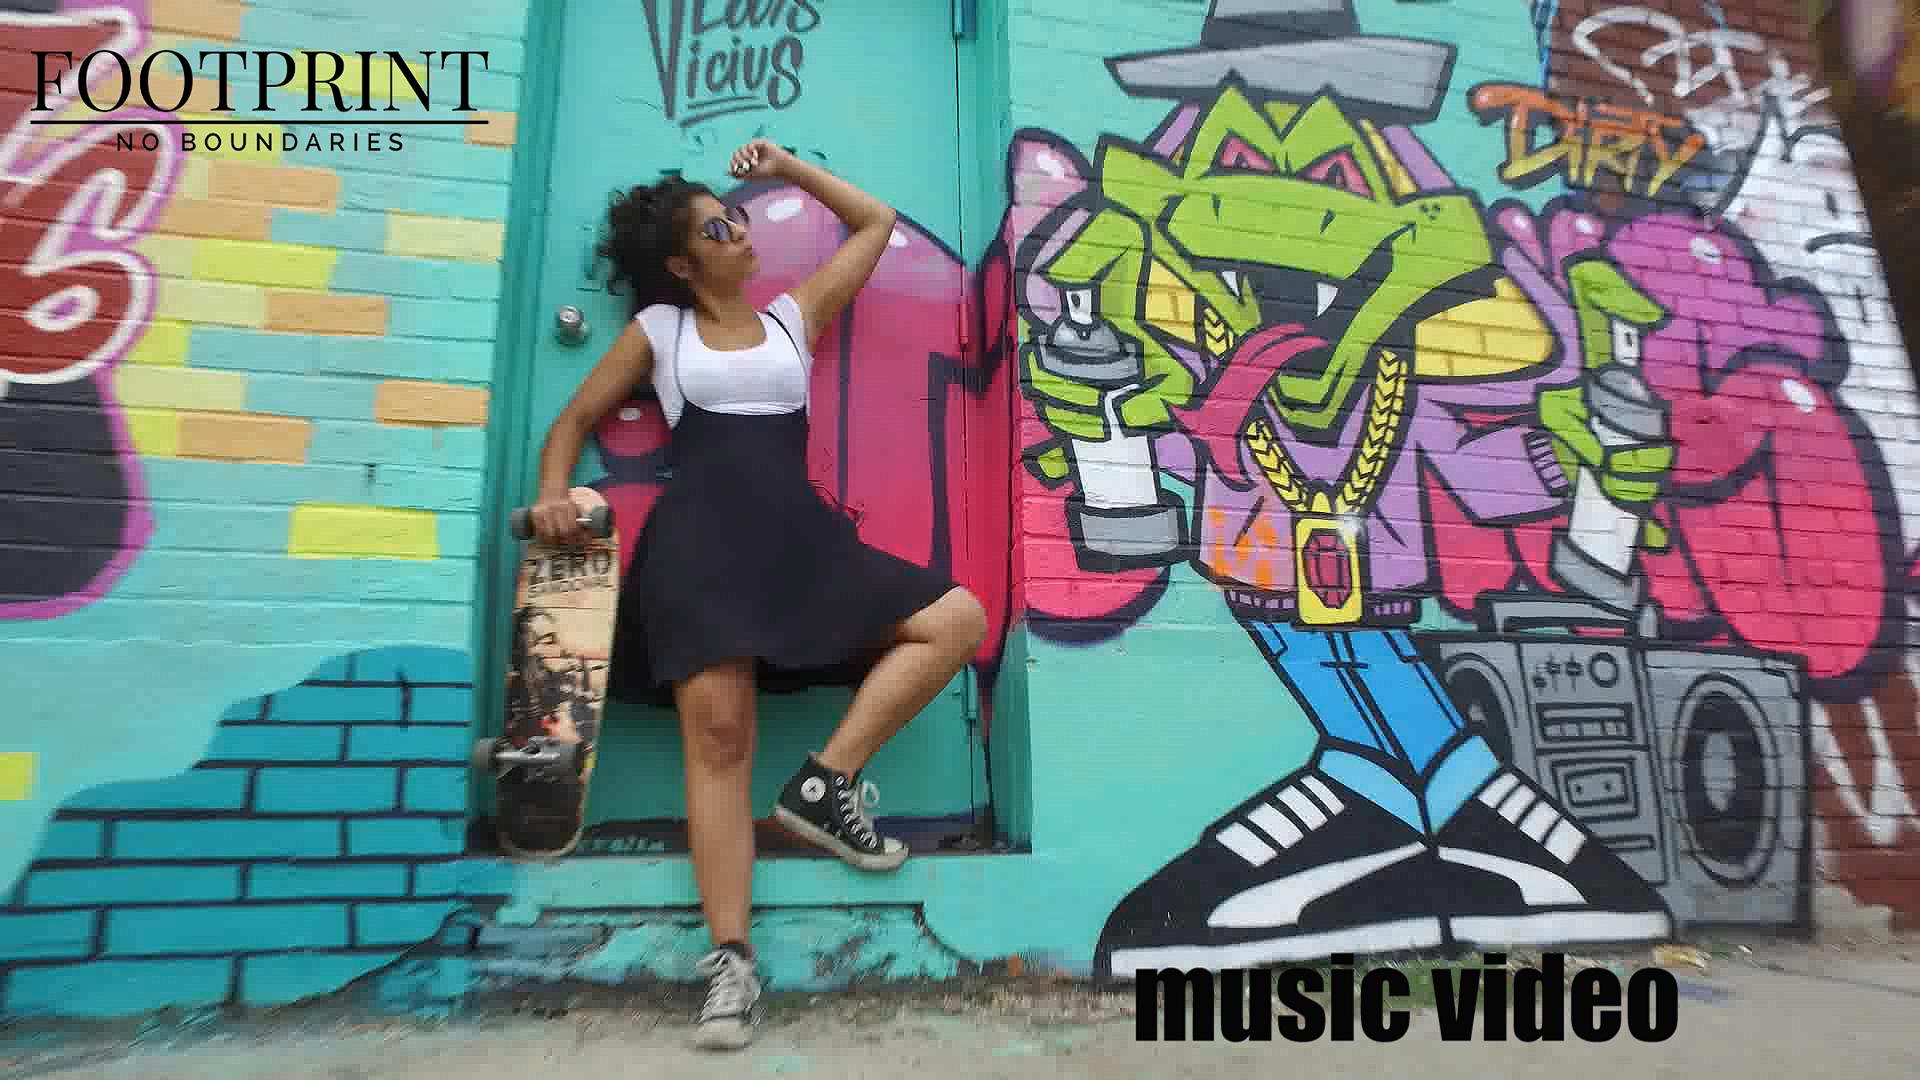 SEREENA GREENE: behind the scenes - music video promo